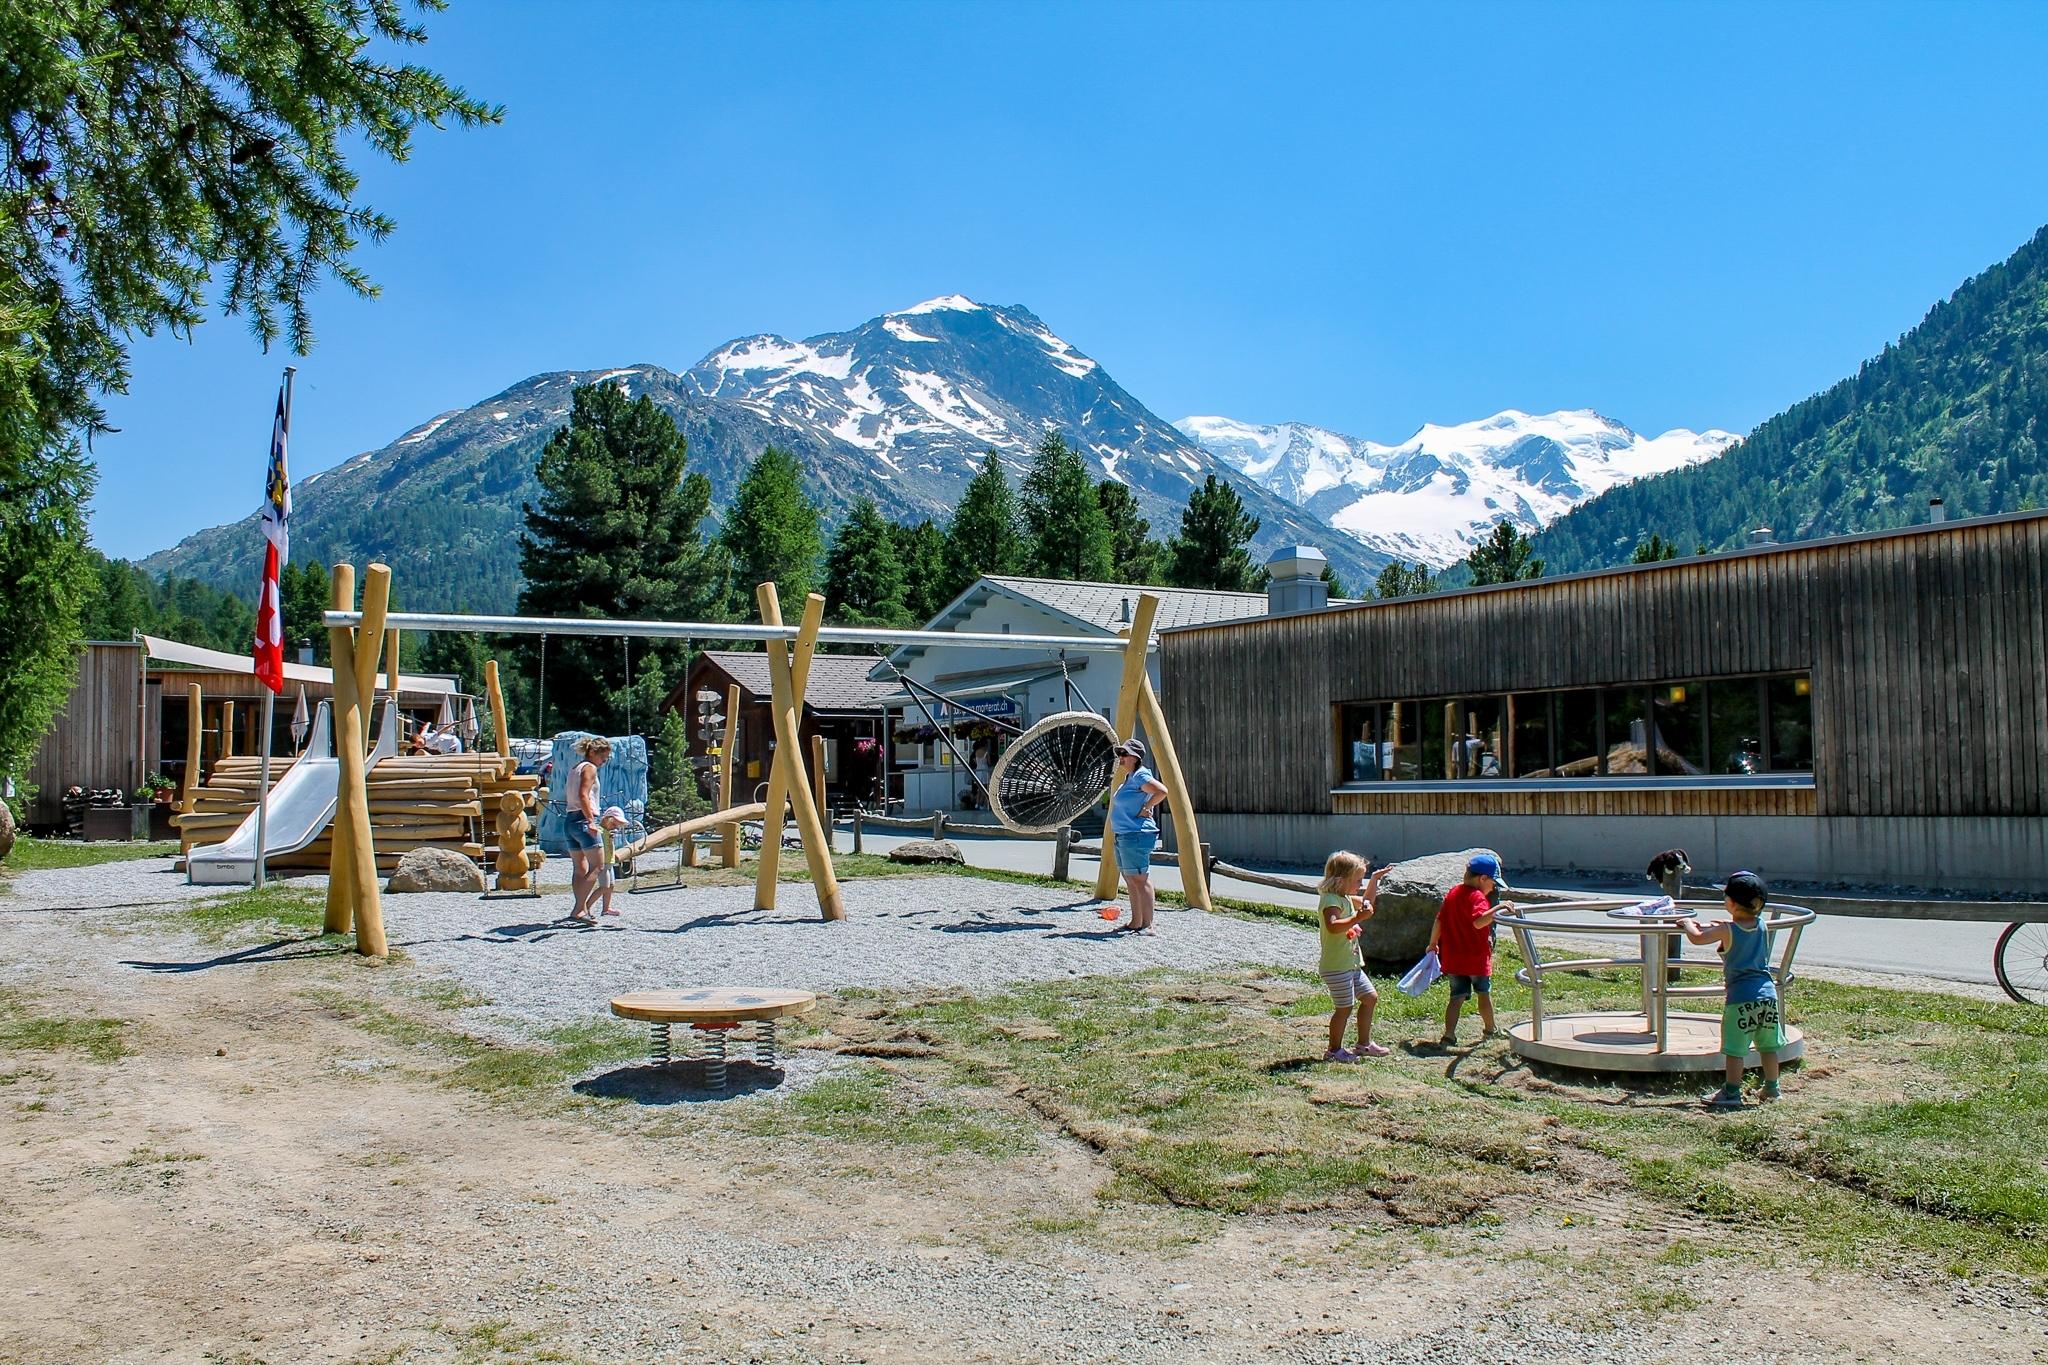 Kinderspielplatz Camping Morteratsch Slide 4